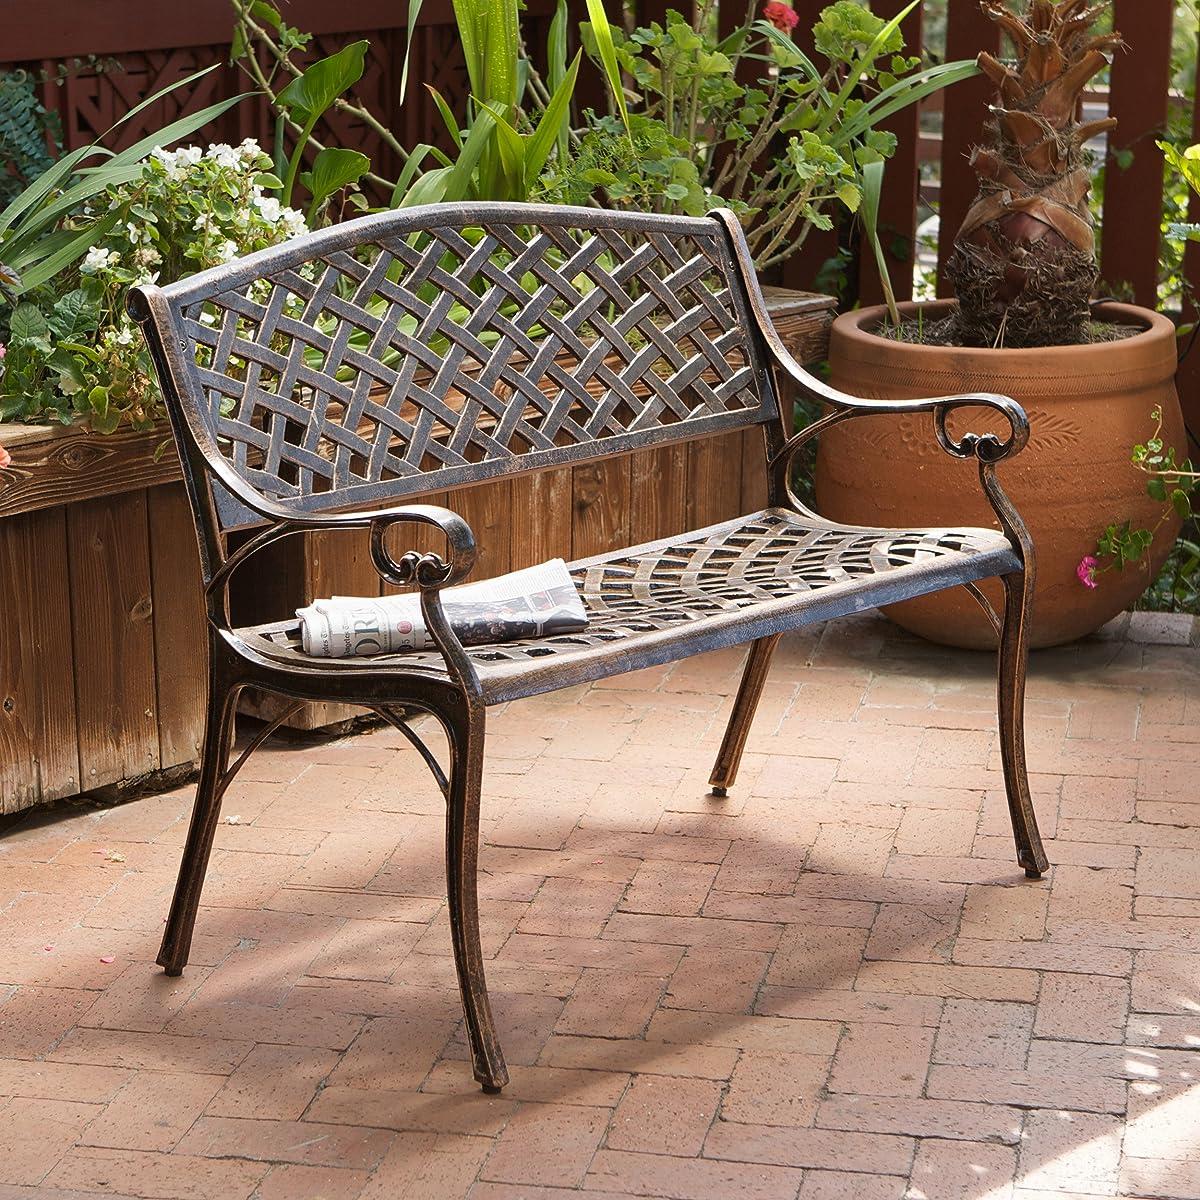 Best Selling Cozumel Cast Aluminum Bench, Antique Copper Finish